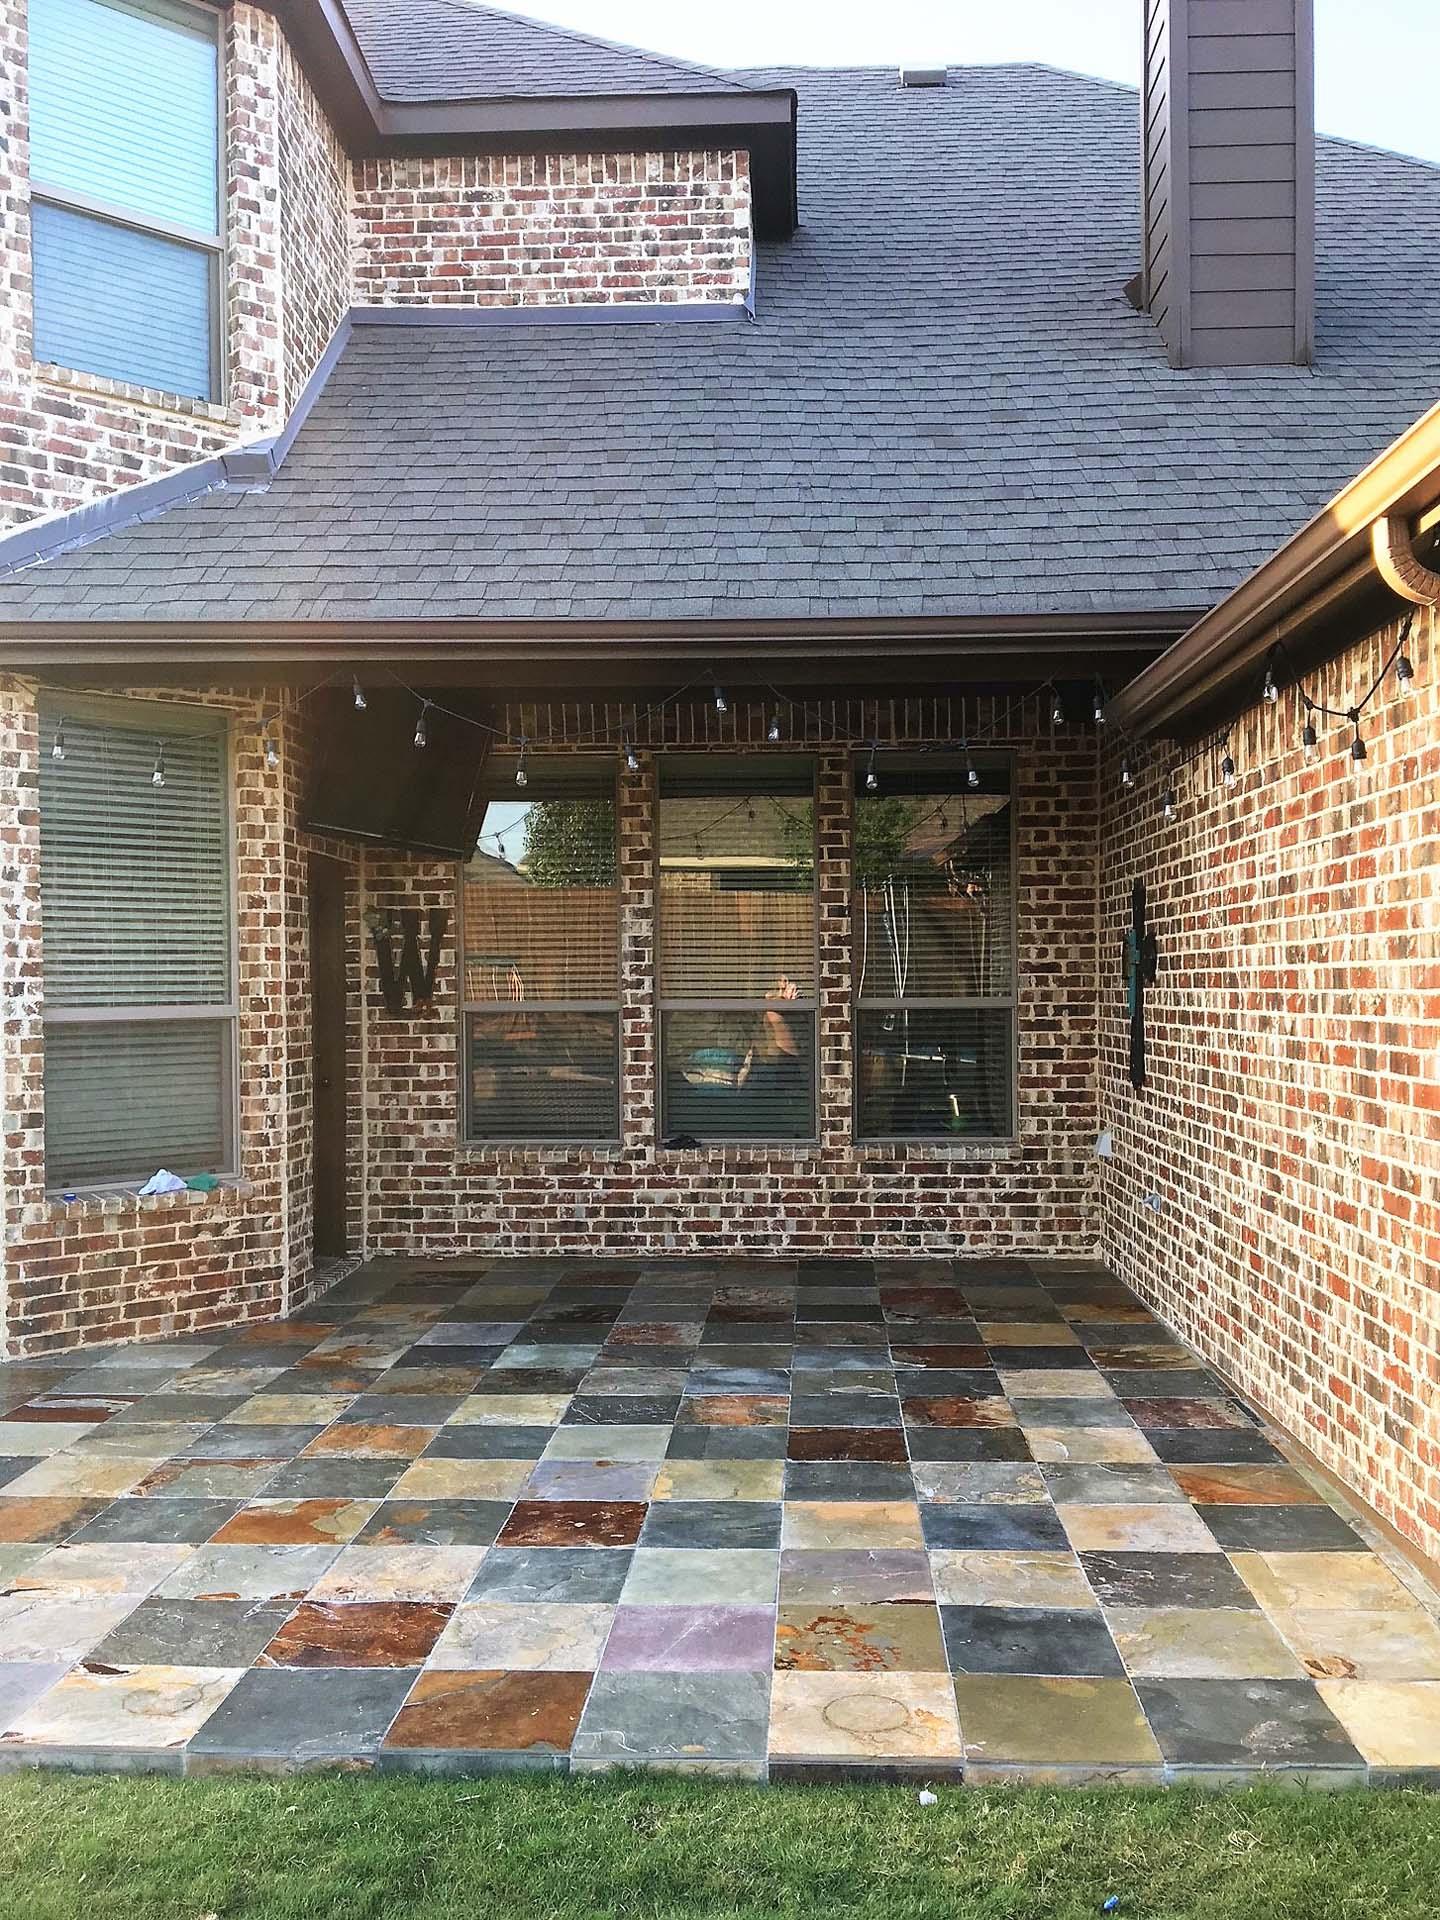 6 Slate Porch Tile